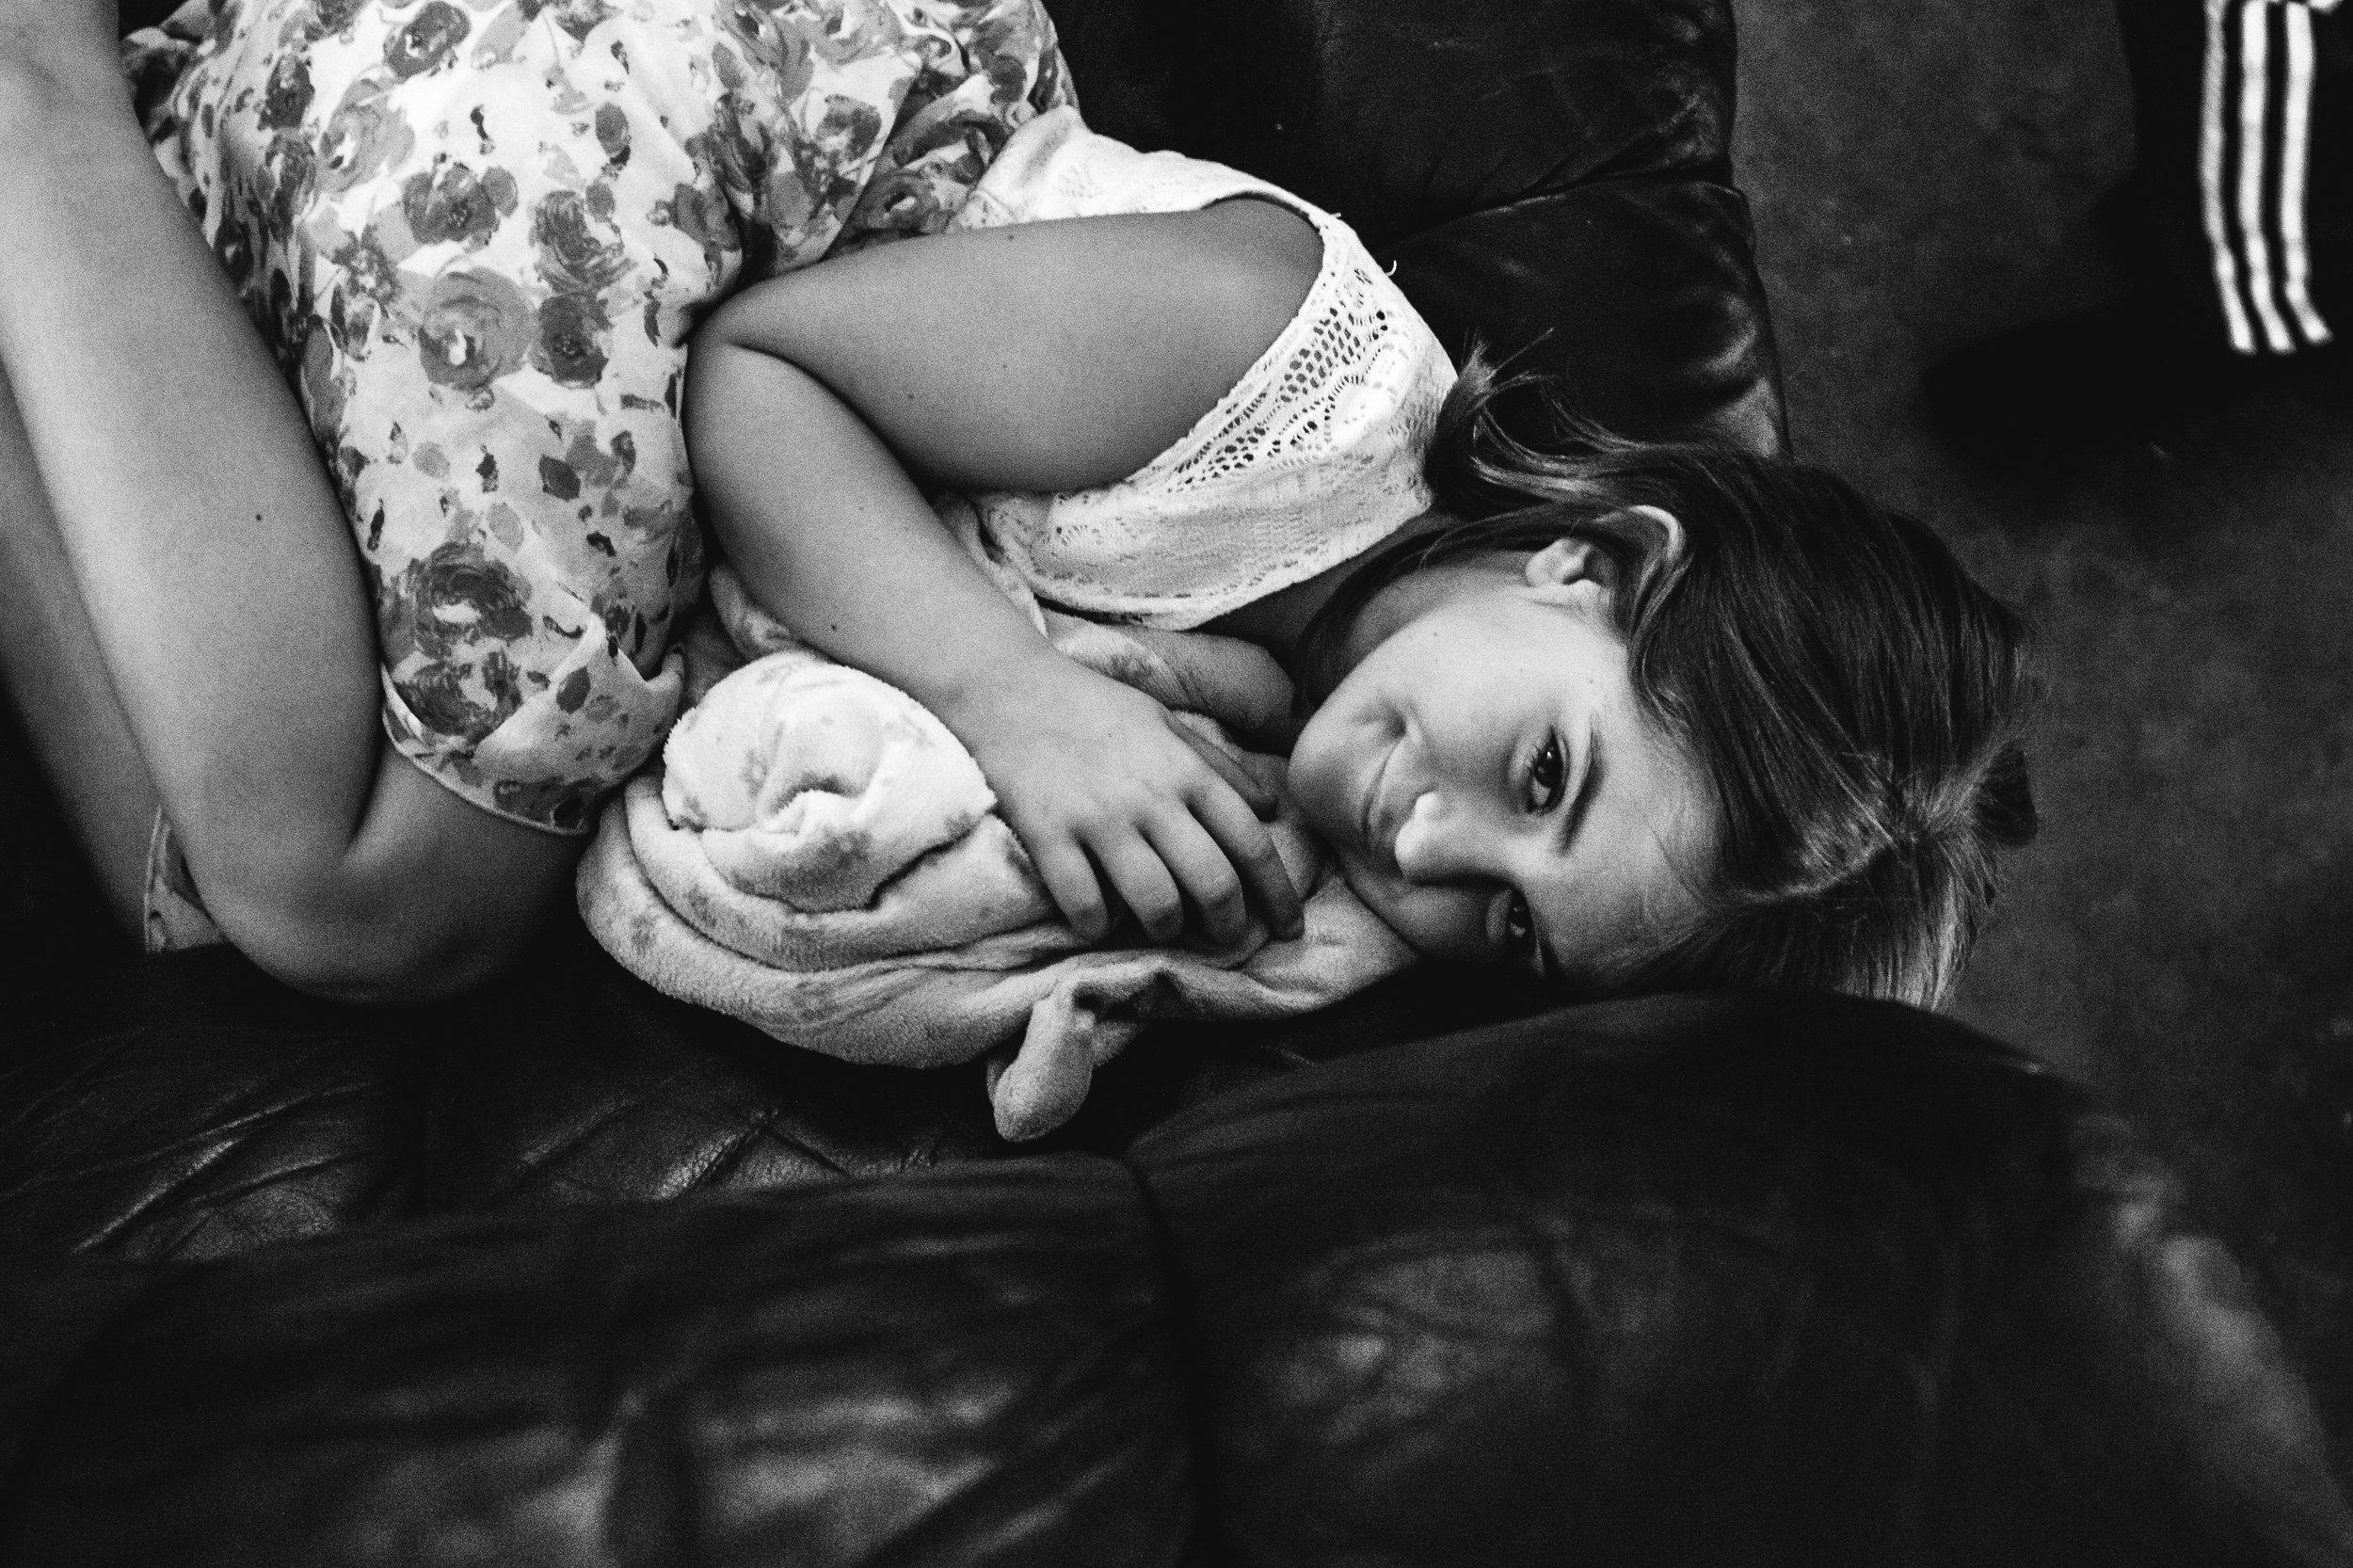 family-photographer-houston-miertschin-9921.jpg